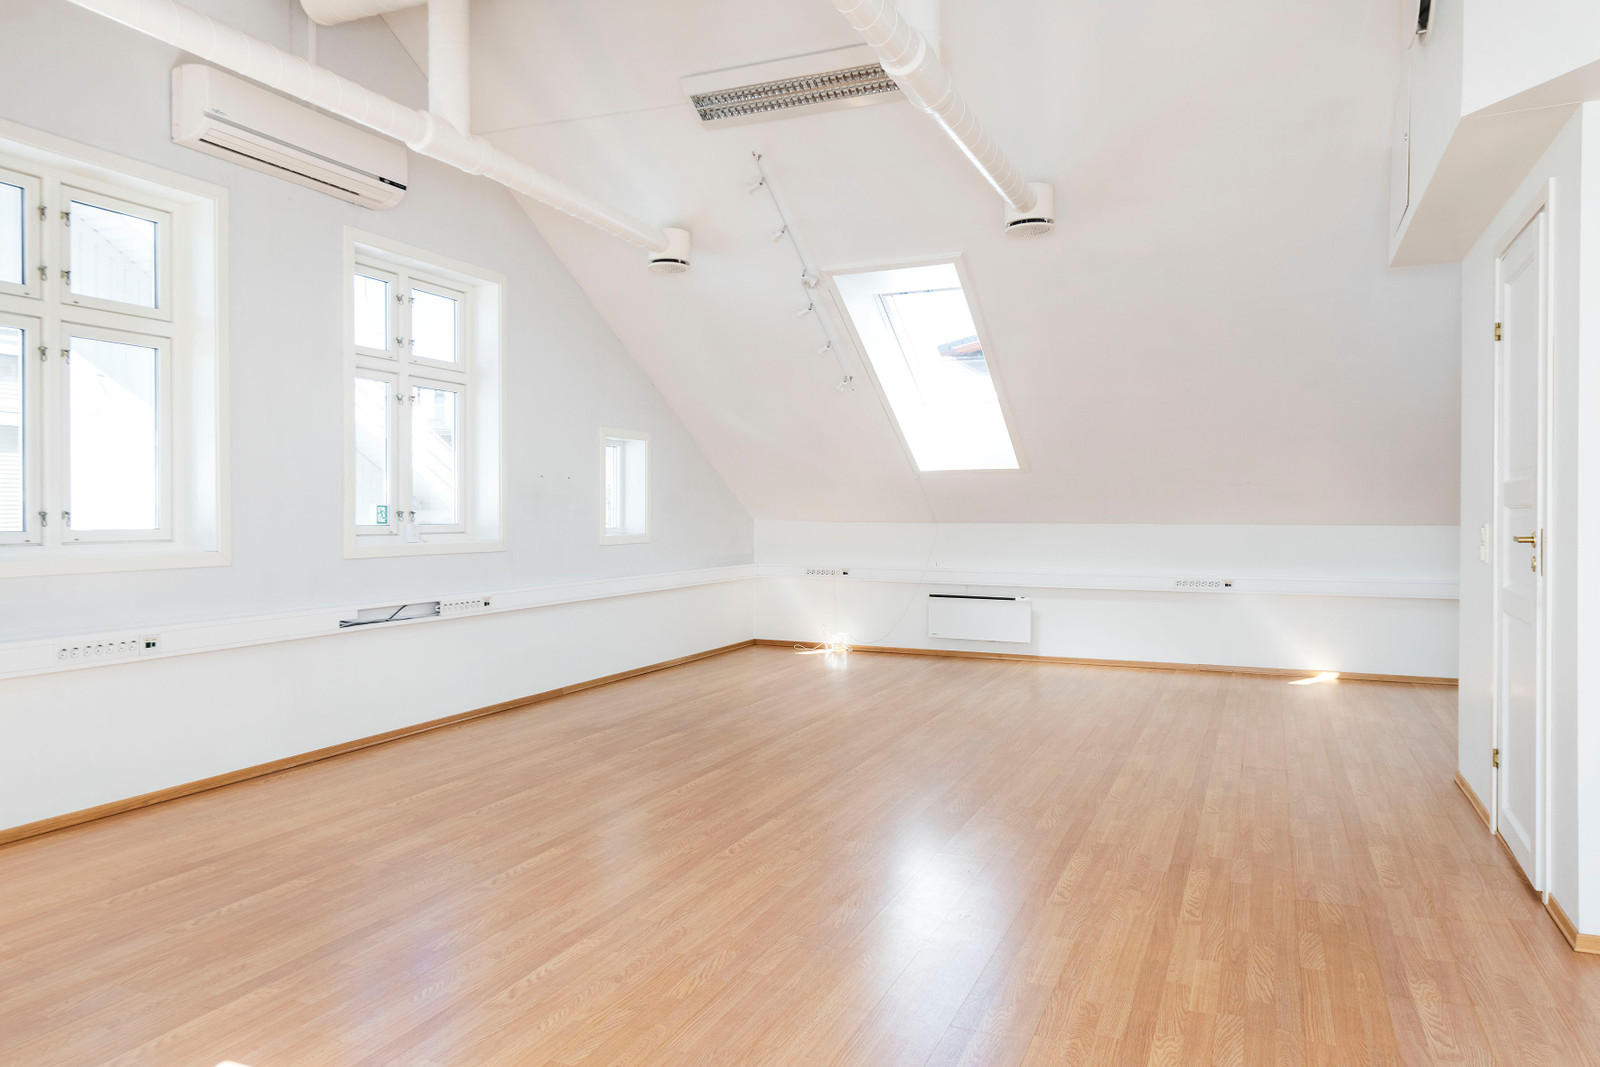 Lyse lokaler med gode lysforhold